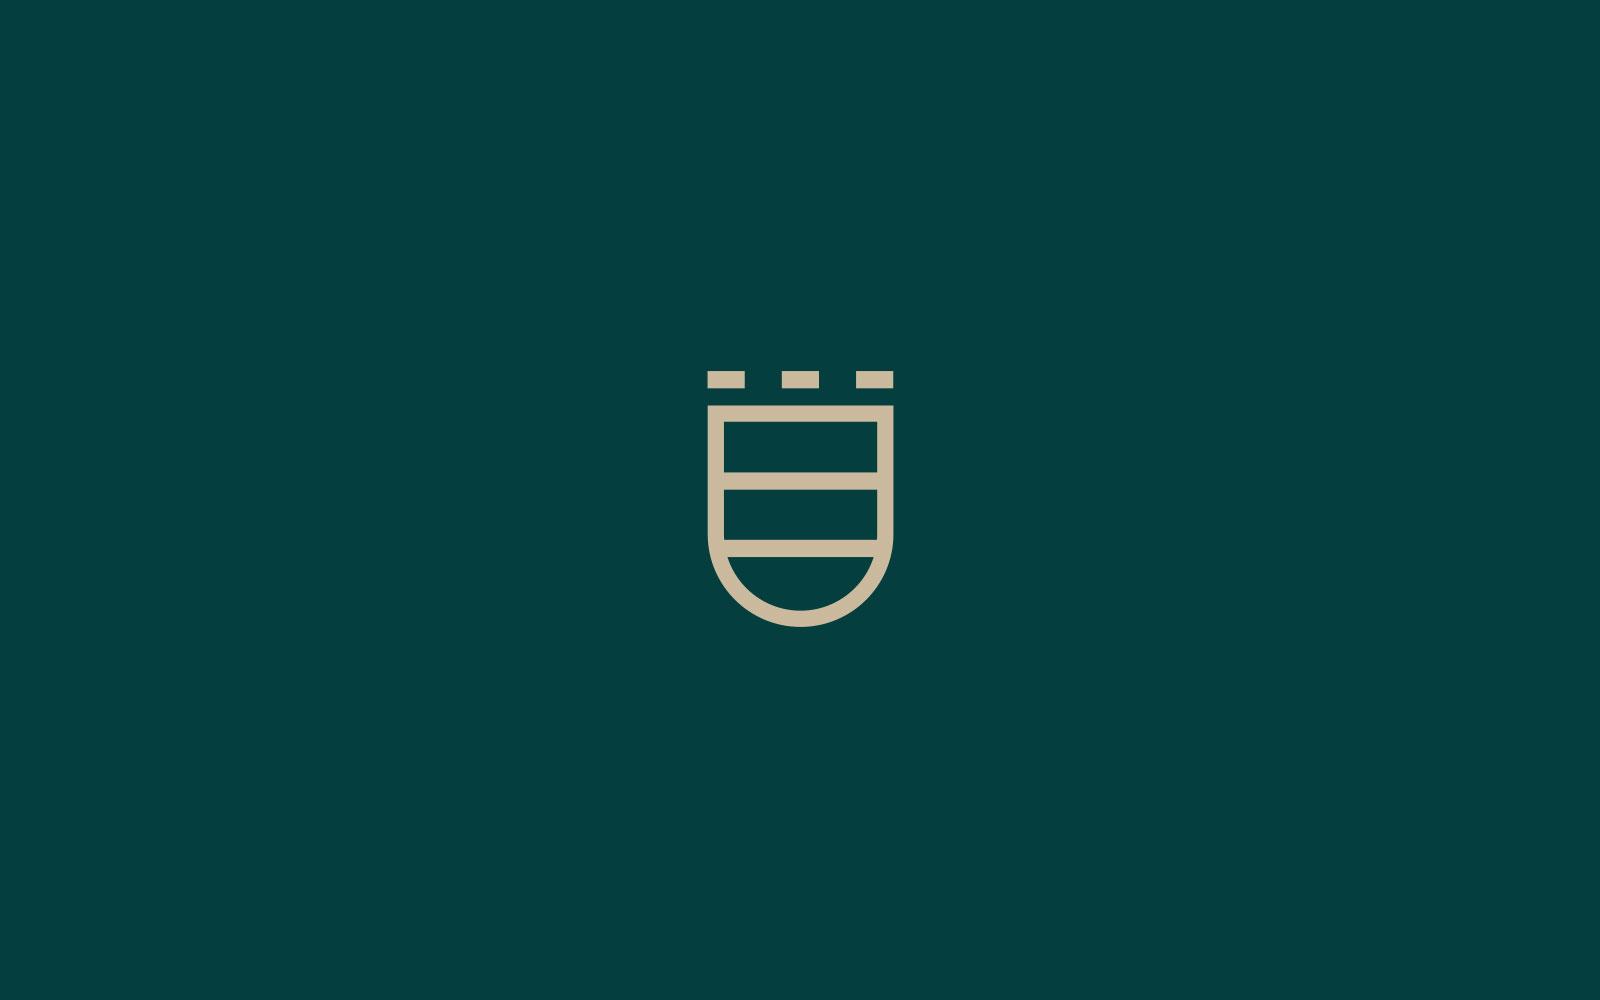 hohenfeld_1600p_logo_1